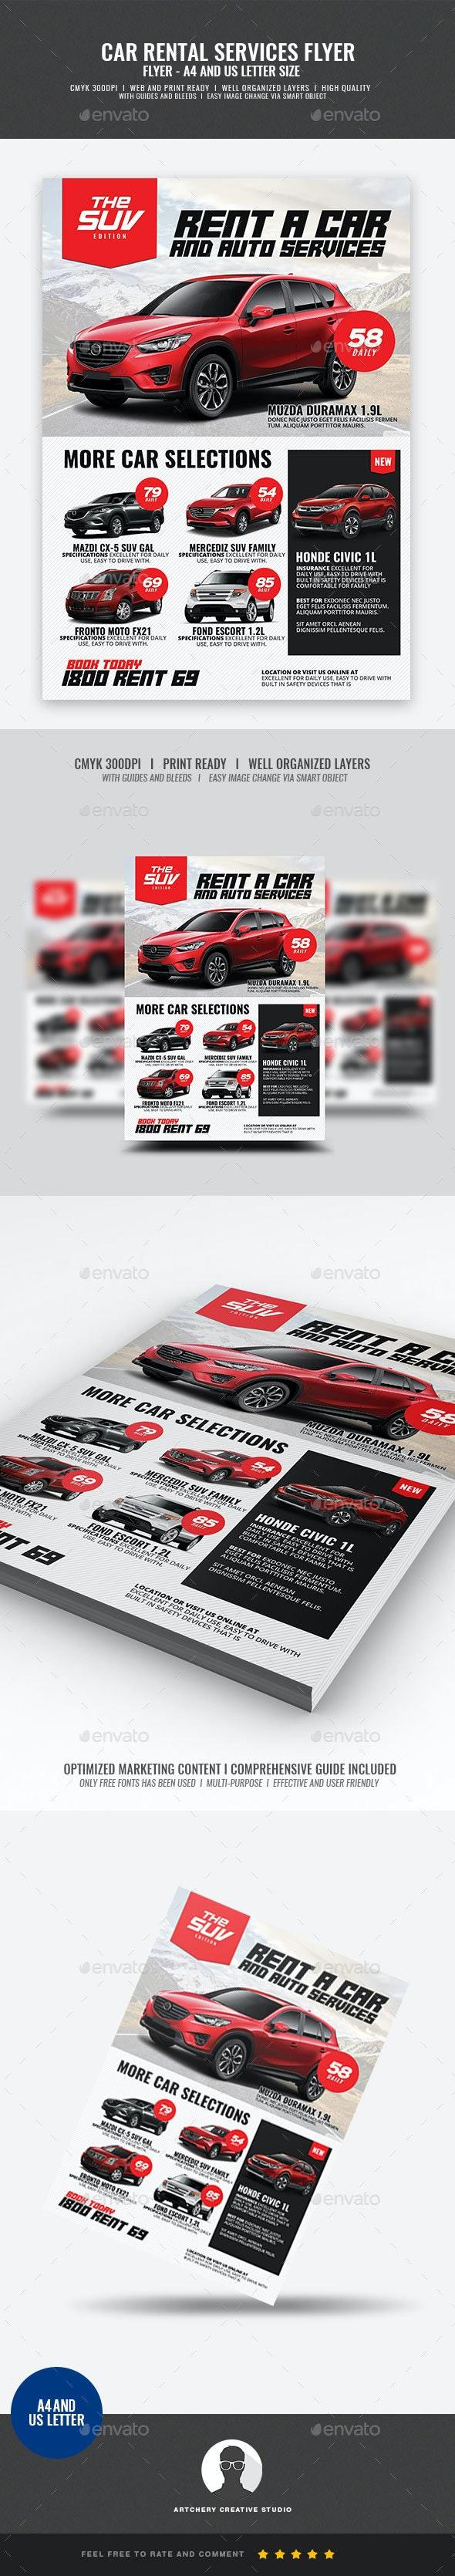 Car Rental Promotional Flyer - Corporate Flyers